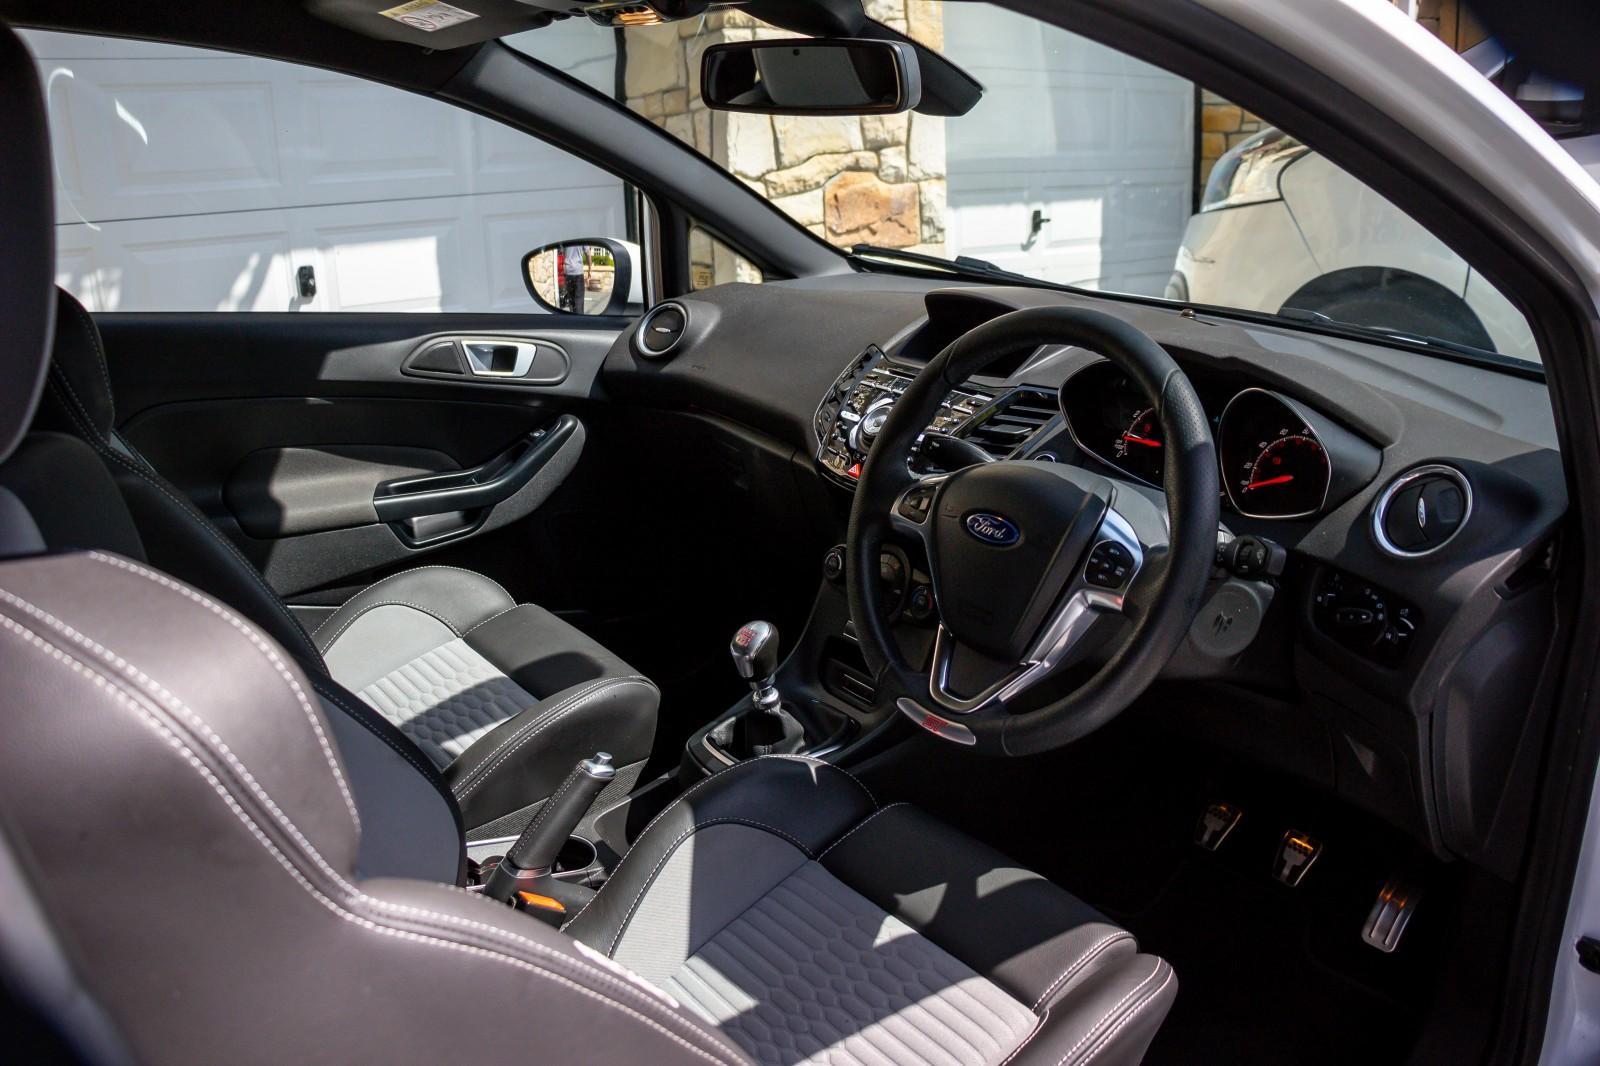 2017 Ford Fiesta ST-3 Petrol Manual – Morgan Cars 9 Mound Road, Warrenpoint, Newry BT34 3LW, UK full